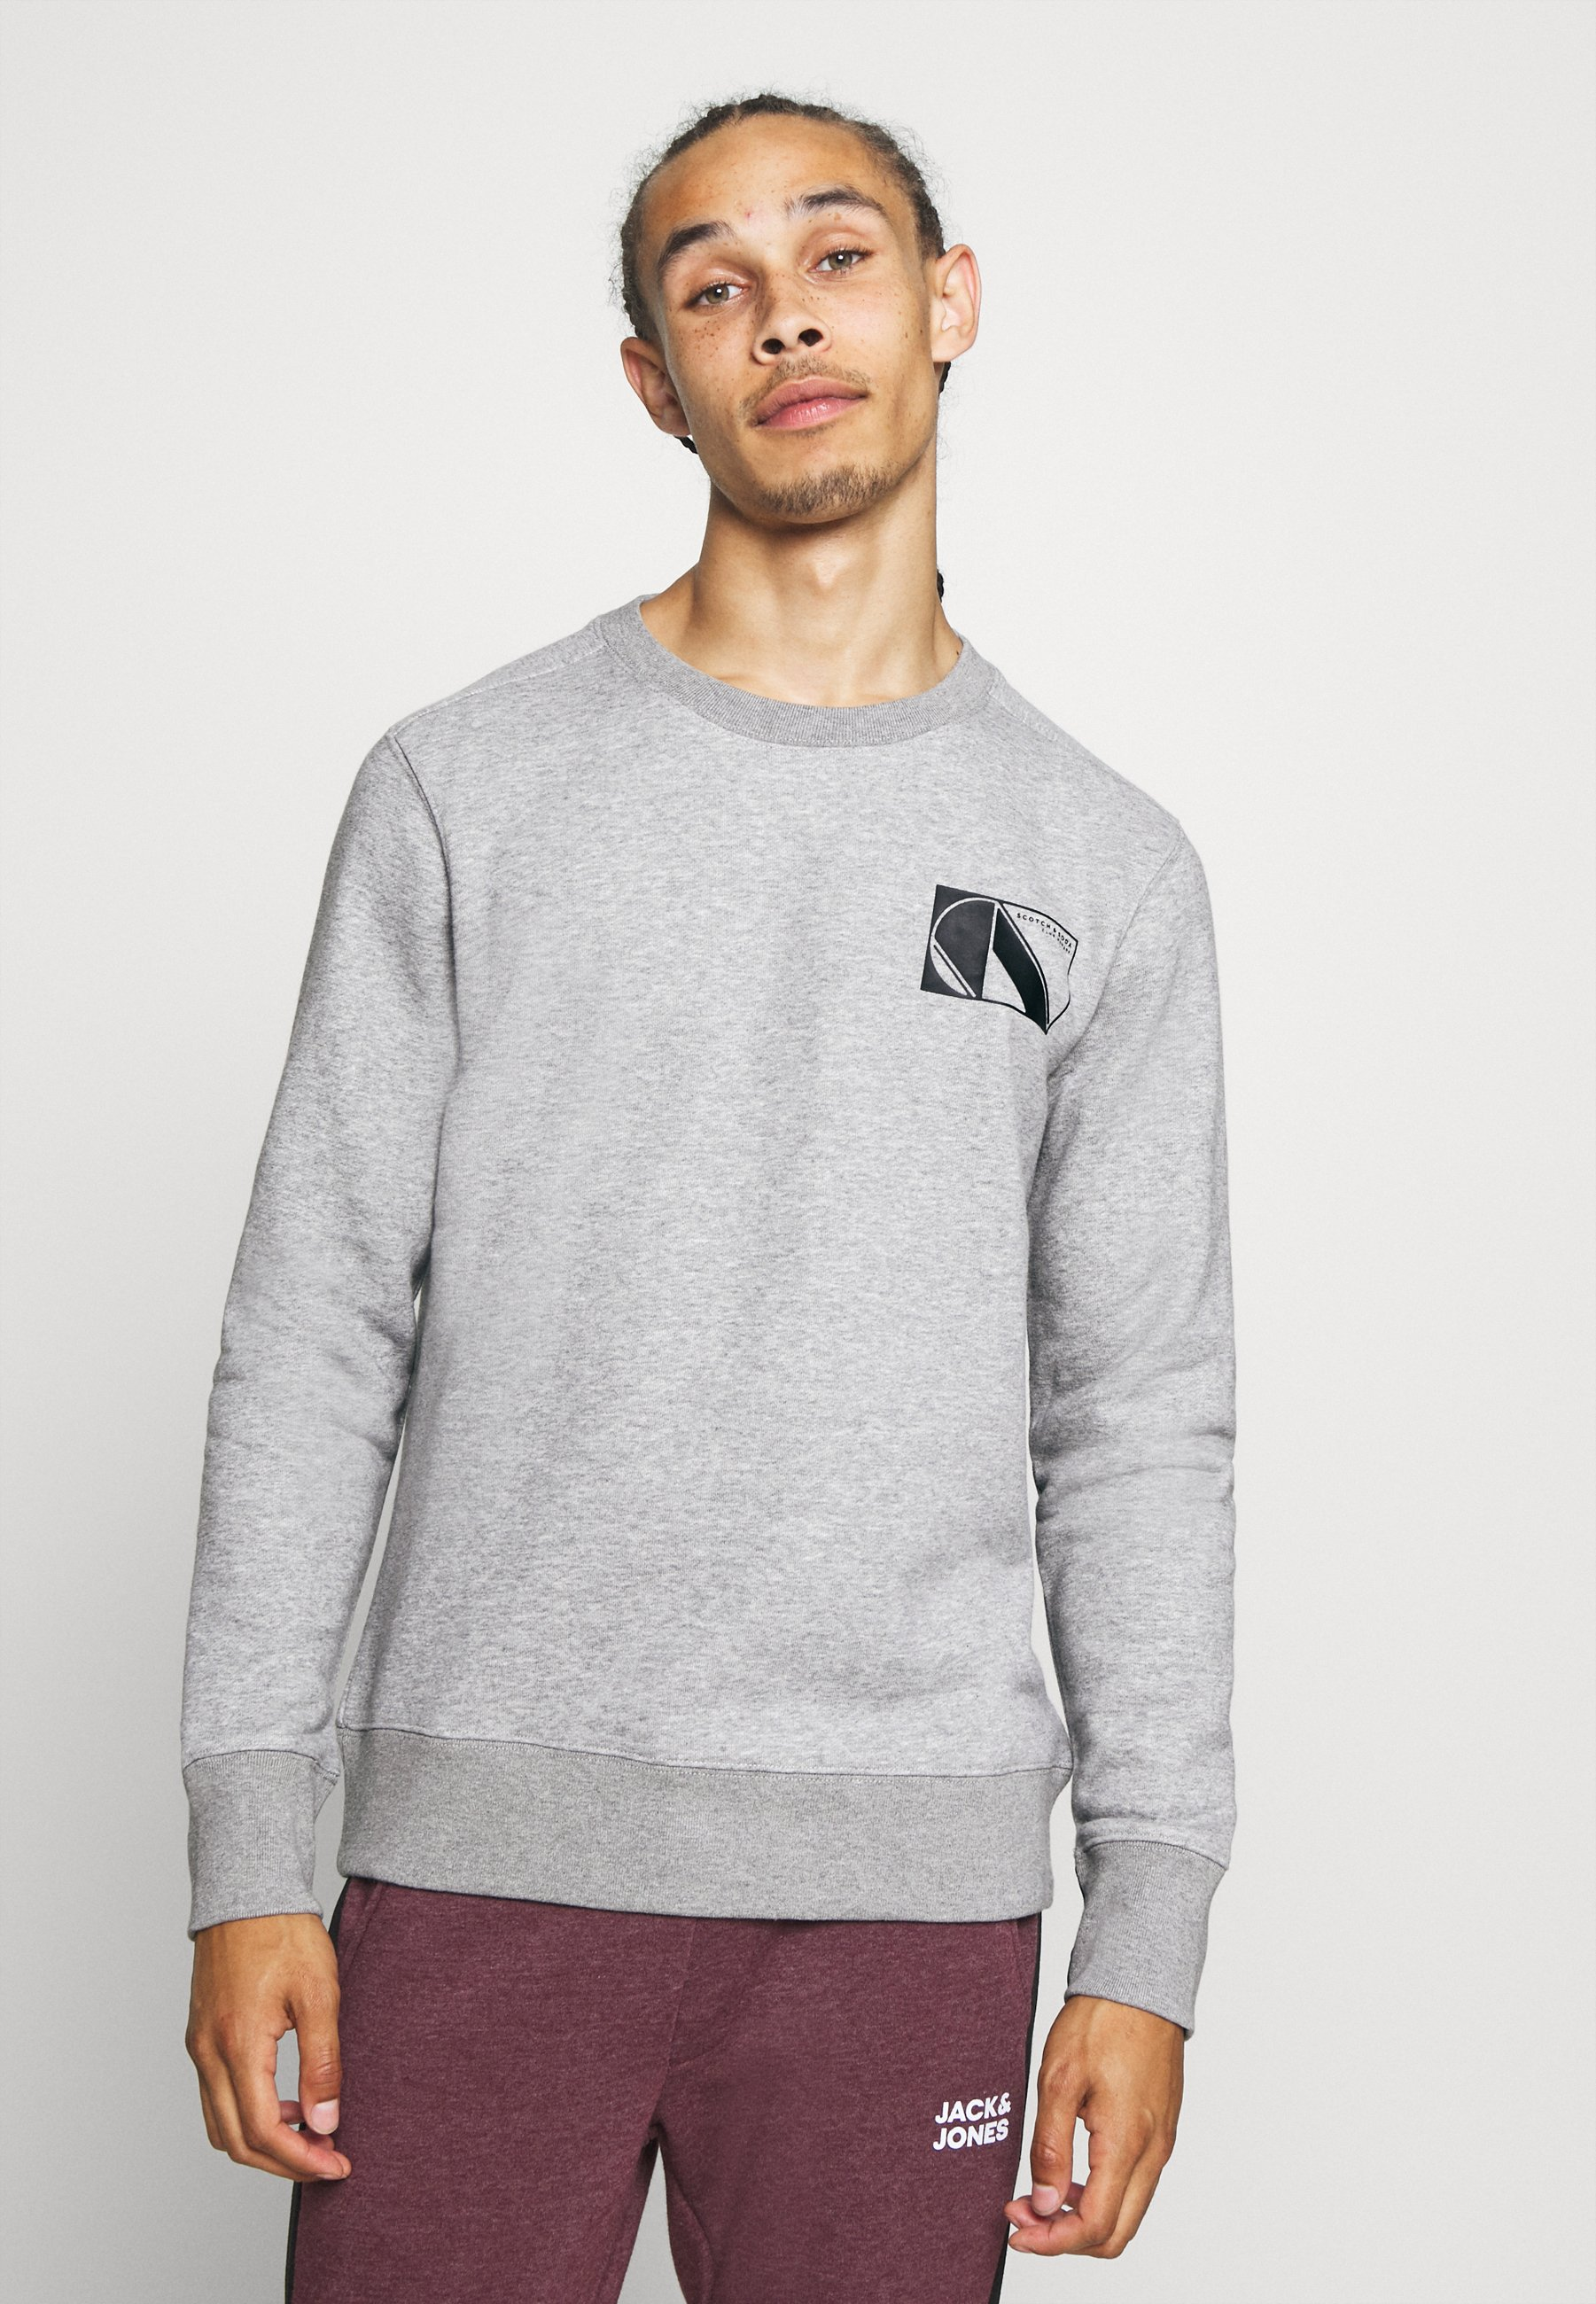 Homme CLUB NOMADE - Sweatshirt